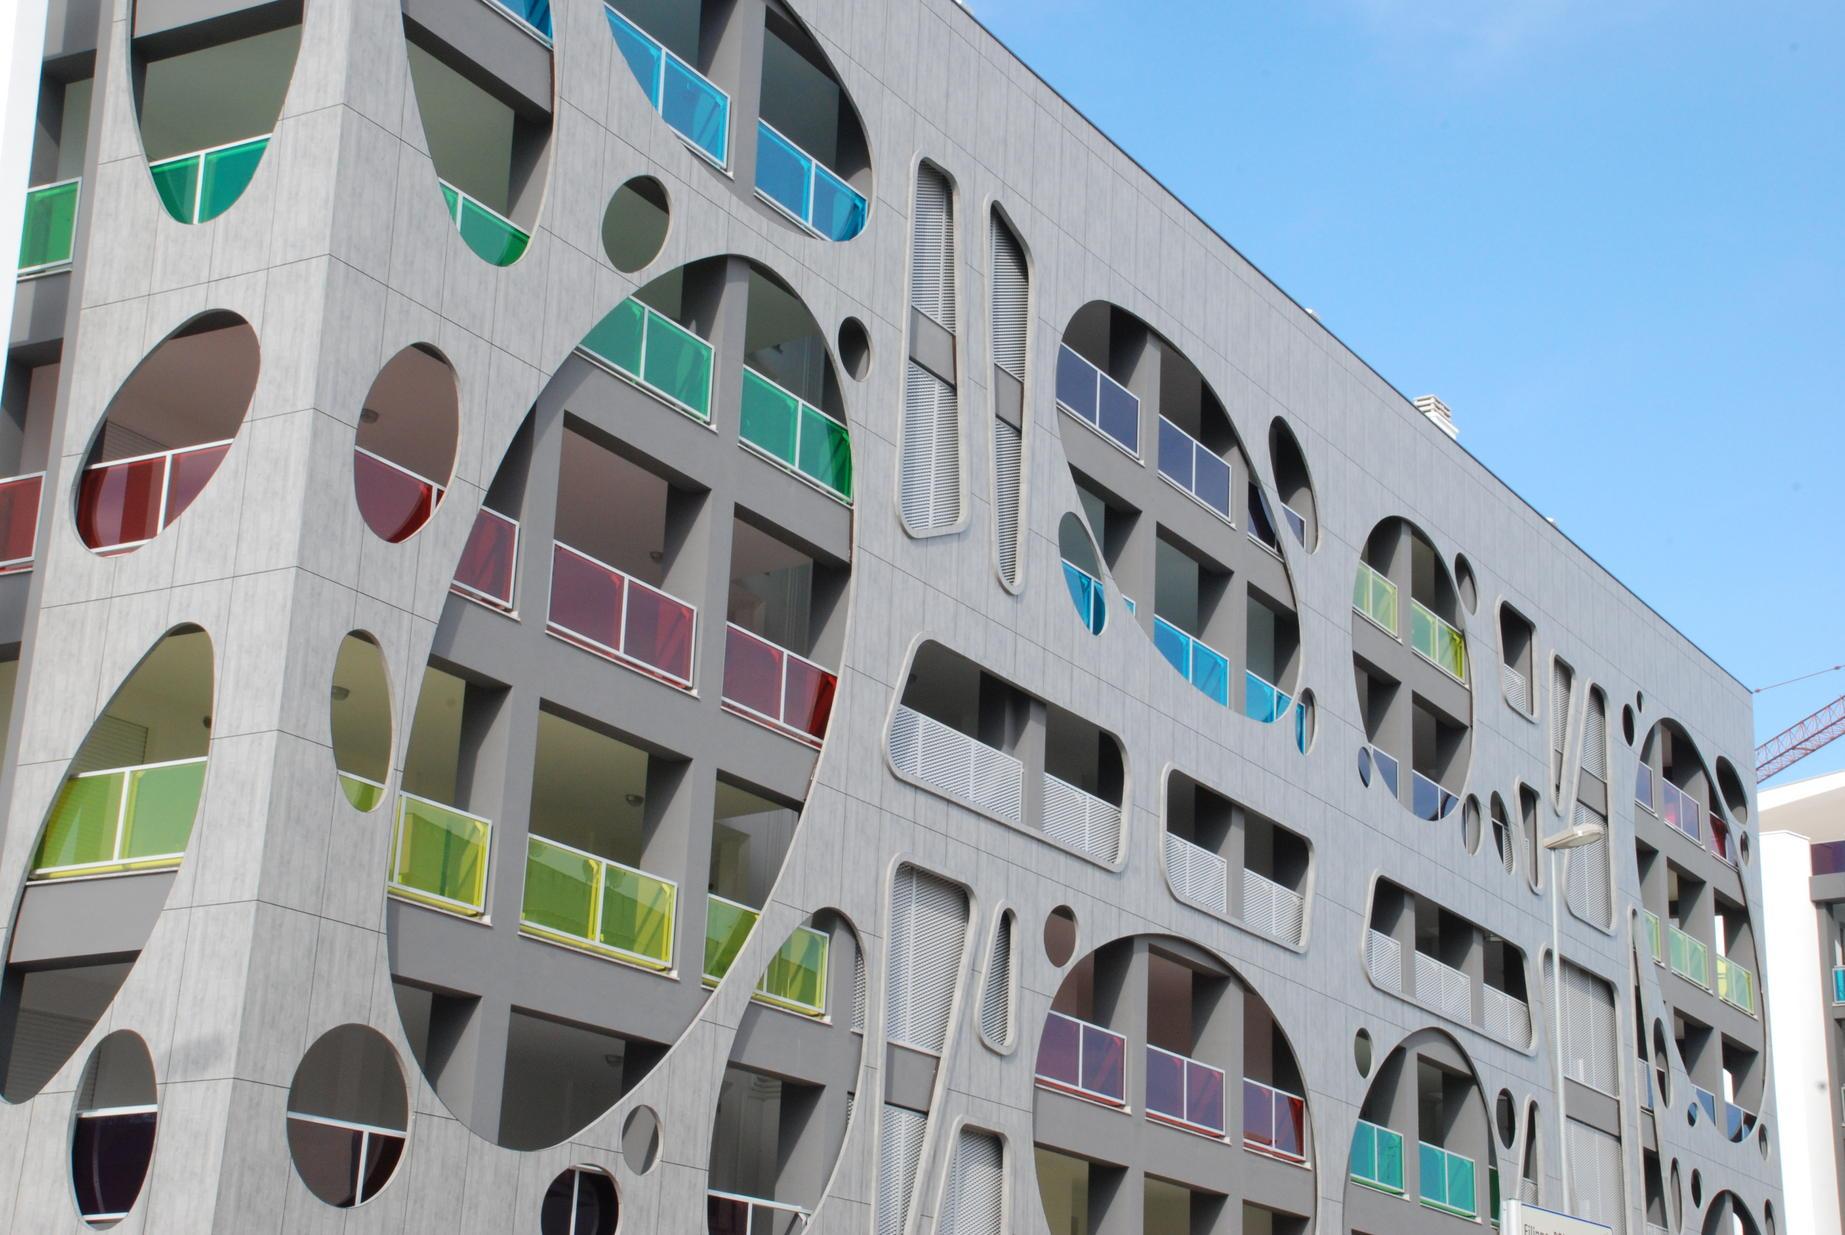 Trespa  BASA Arquitectura y Diseo